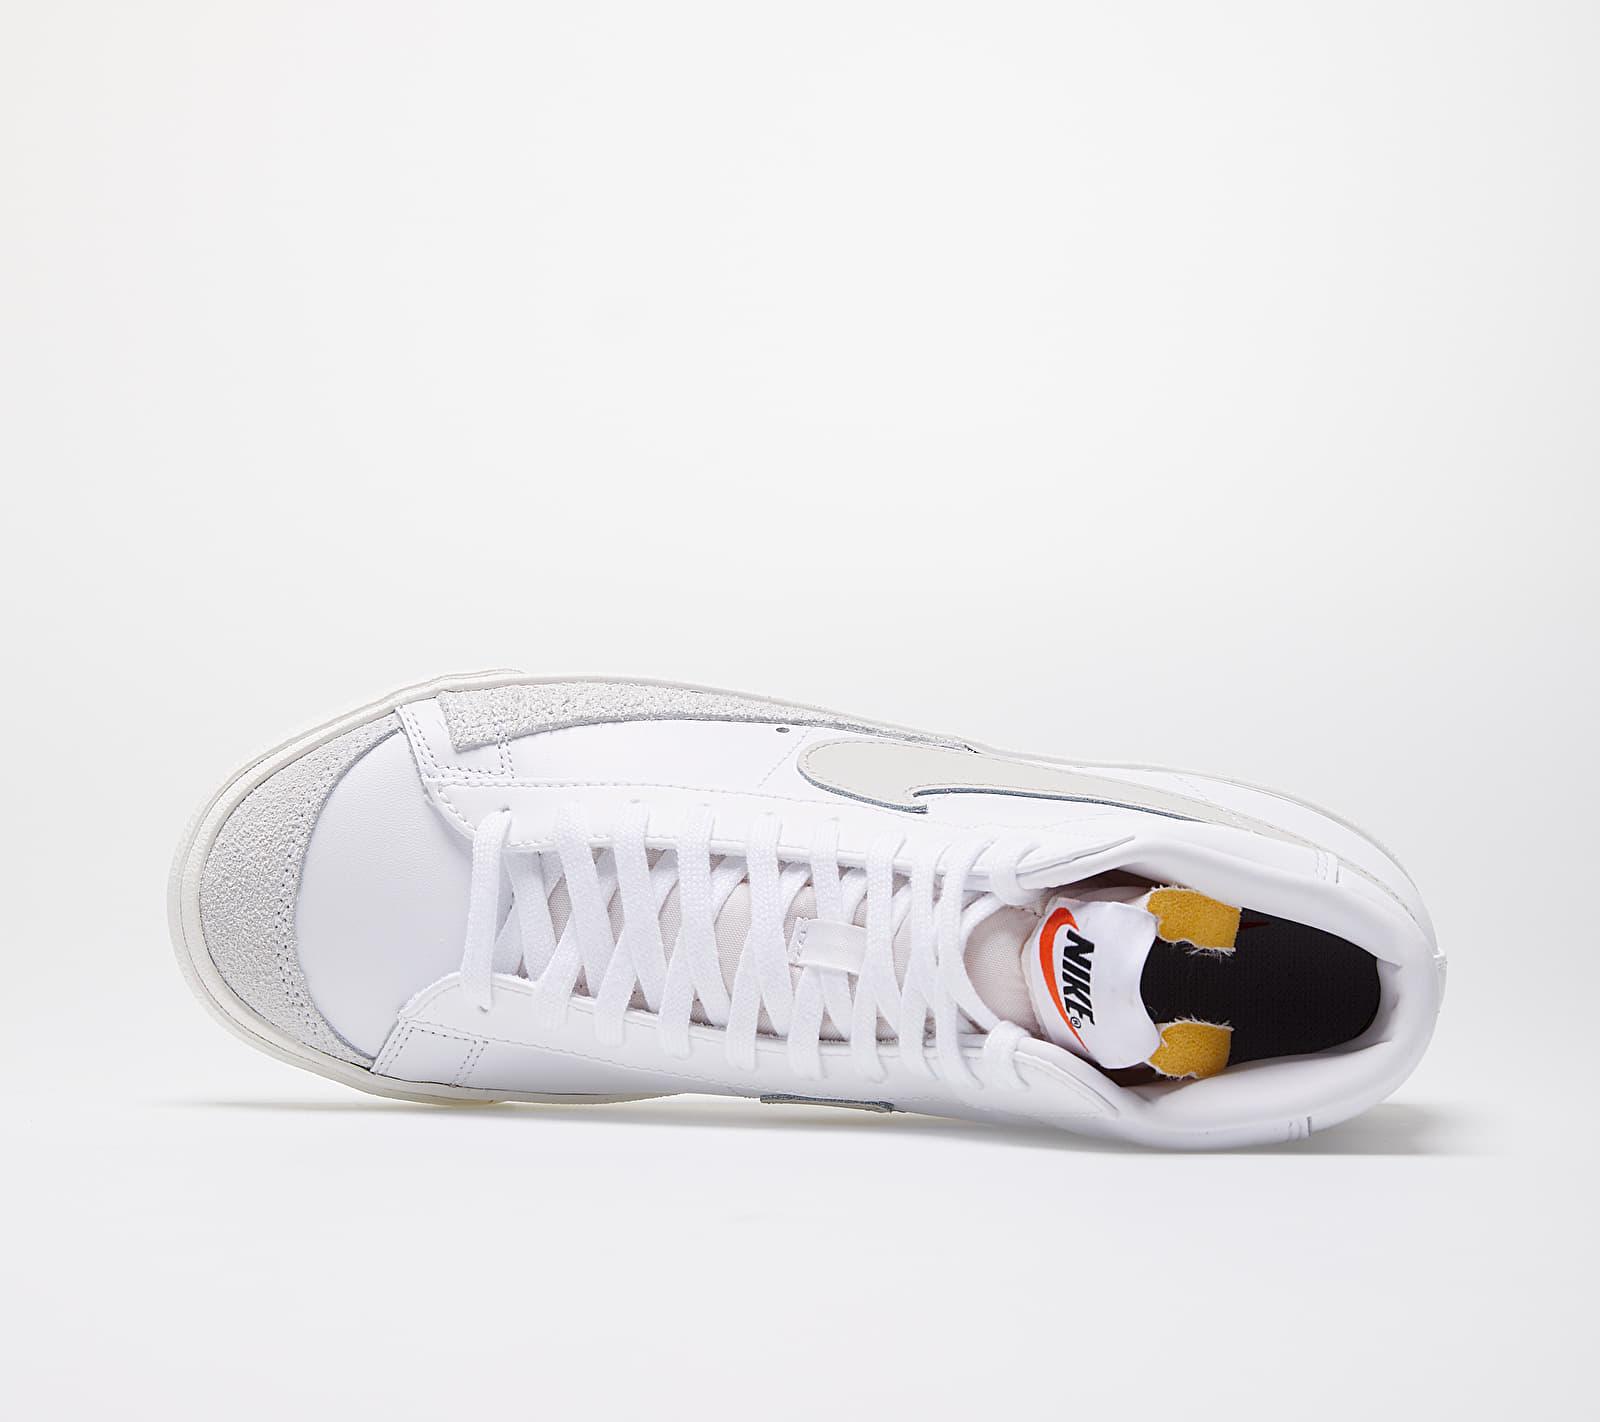 Nike Blazer Mid '77 Vintage White/ Light Bone-Sail